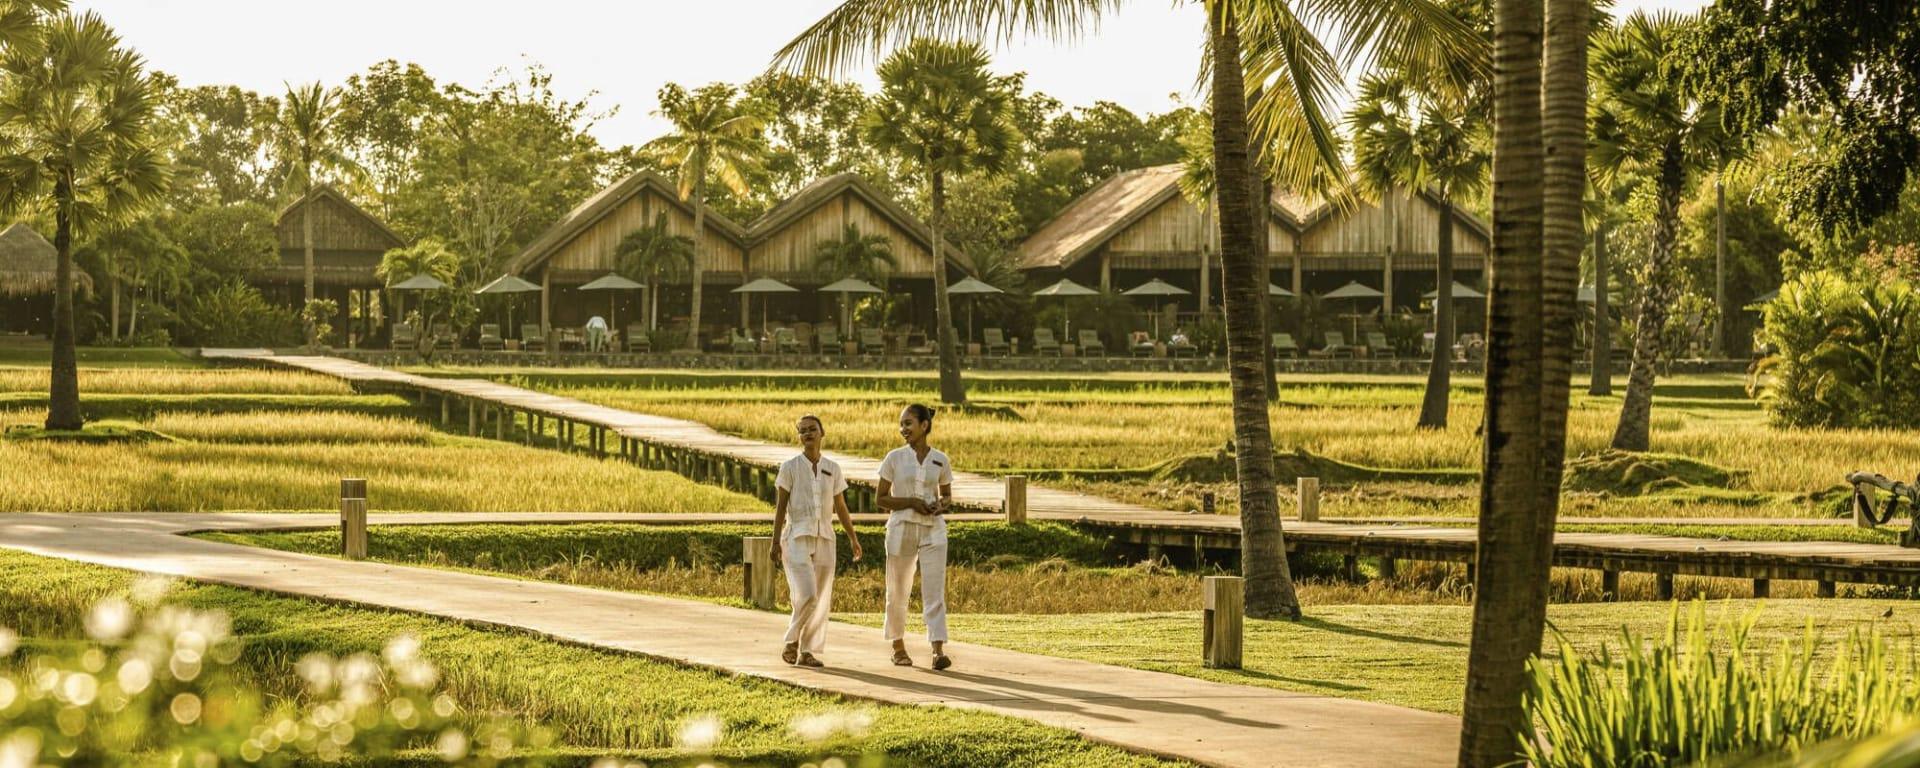 Phum Baitang in Siem Reap: Garden & Grounds